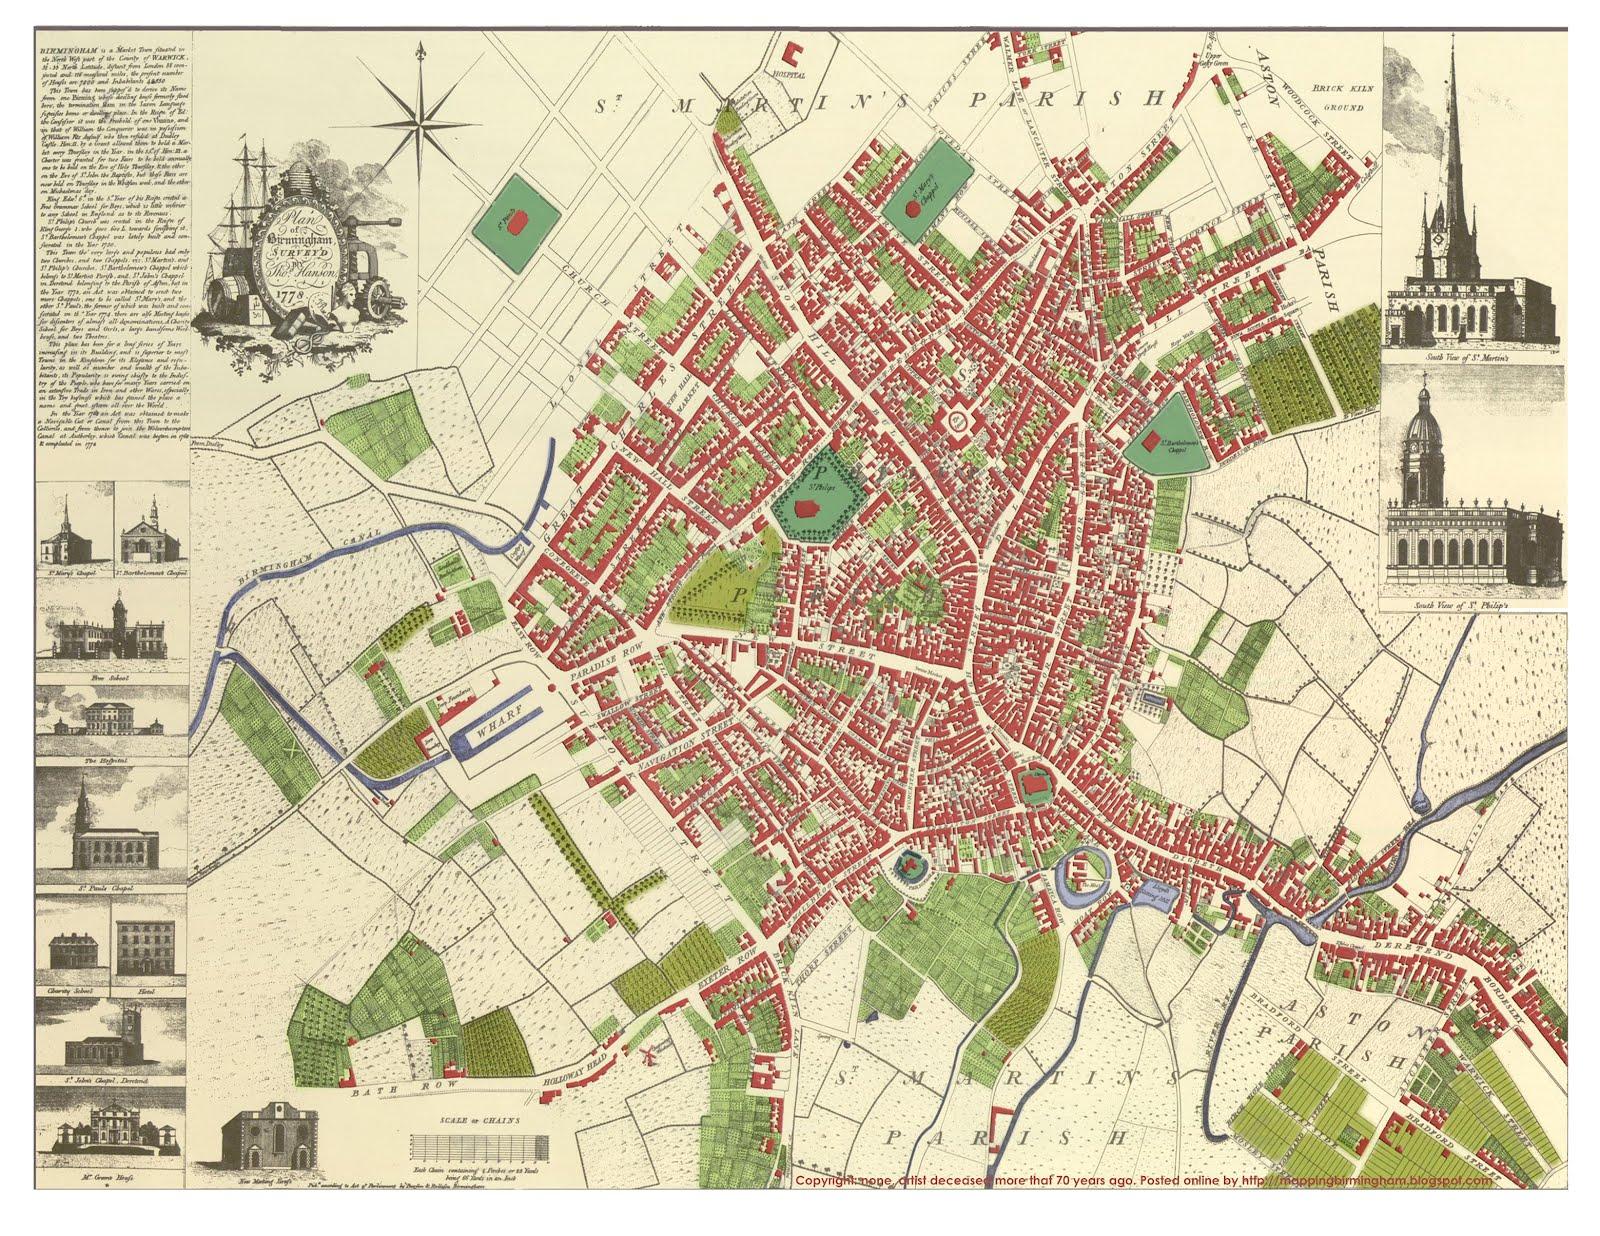 Eighteenth Century Birmingham 1778 Map of Birmingham